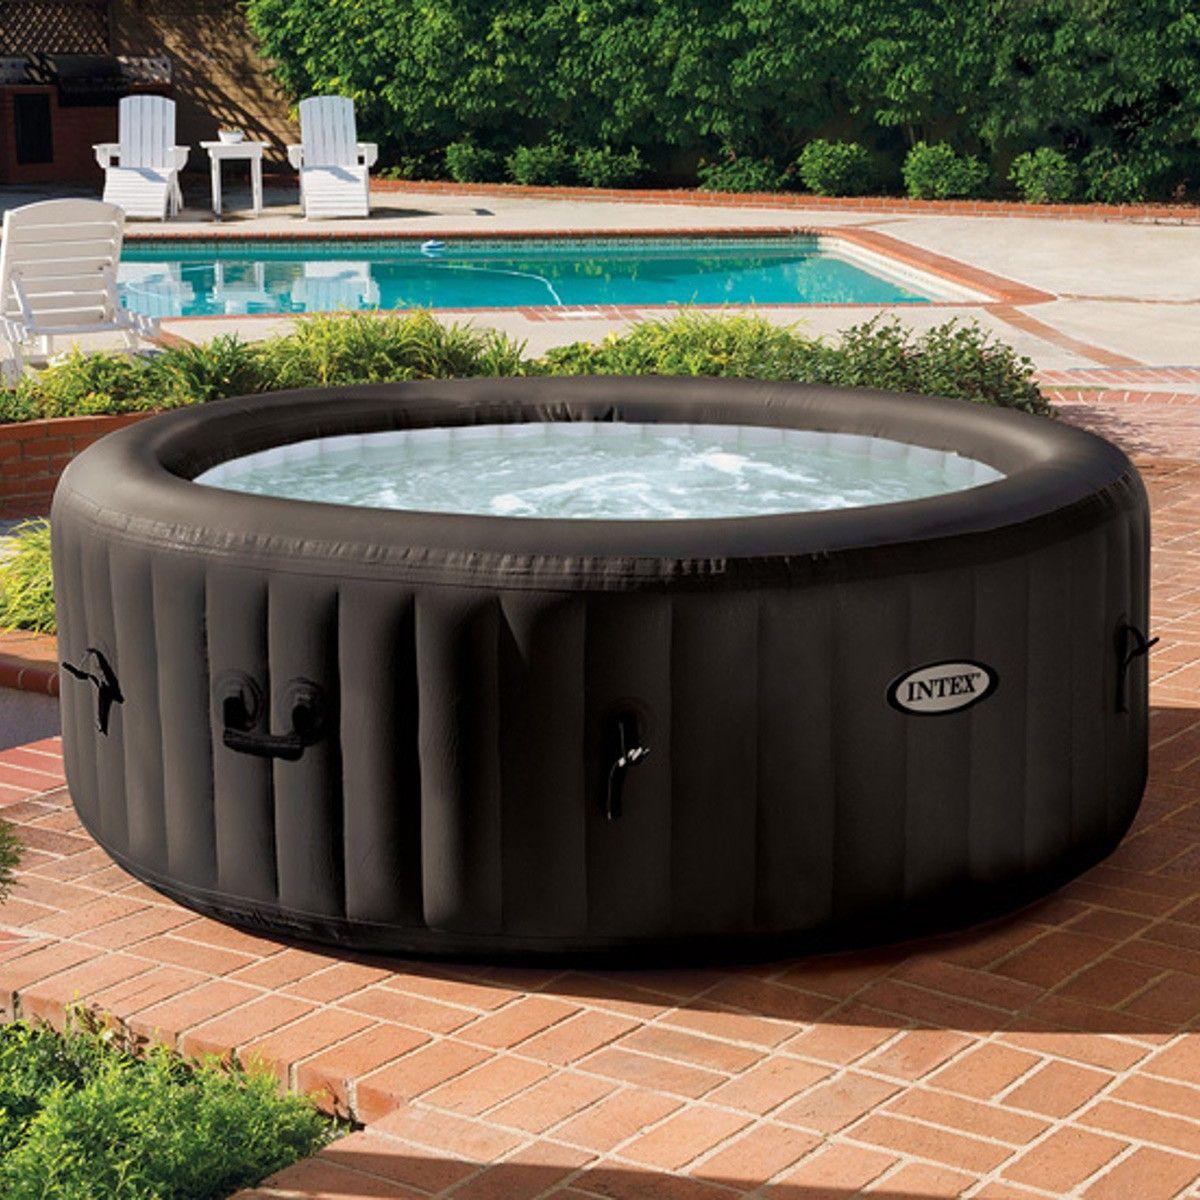 Intex PureSpa Jet Massage Hot Tub - 77 | Spa | Pinterest | Hot tubs